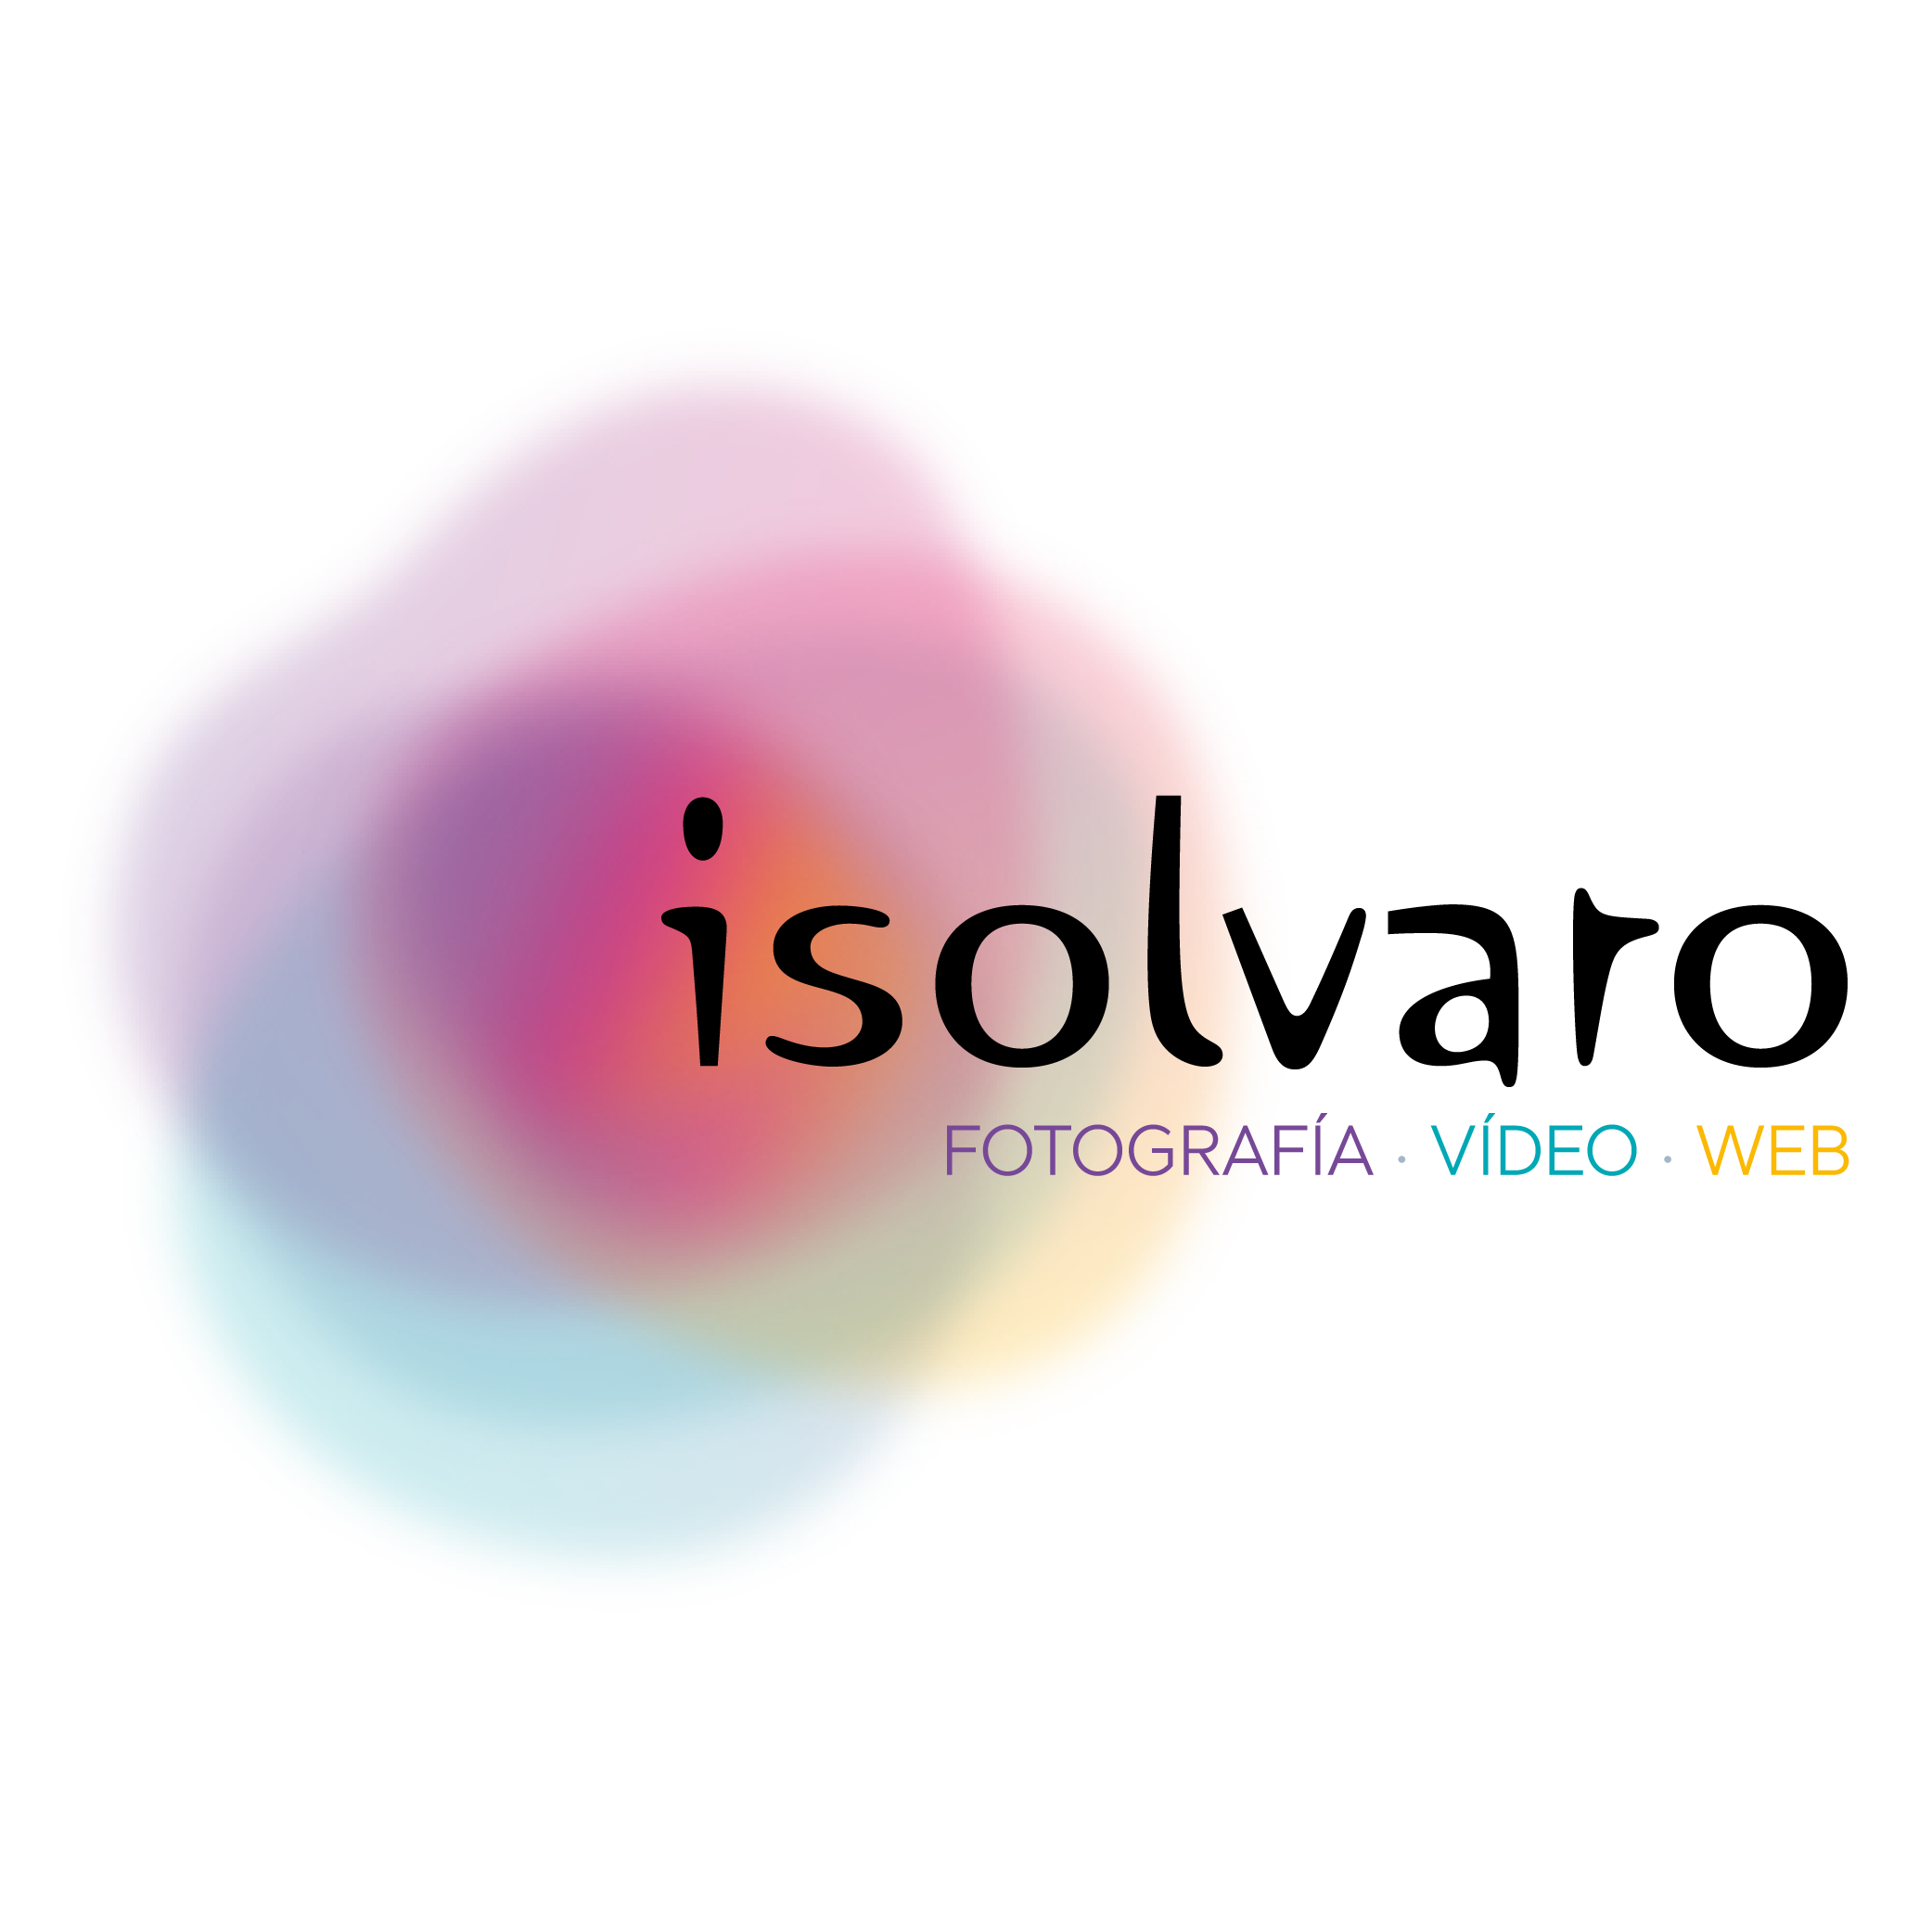 isolvaro Fotografía Vídeo Web